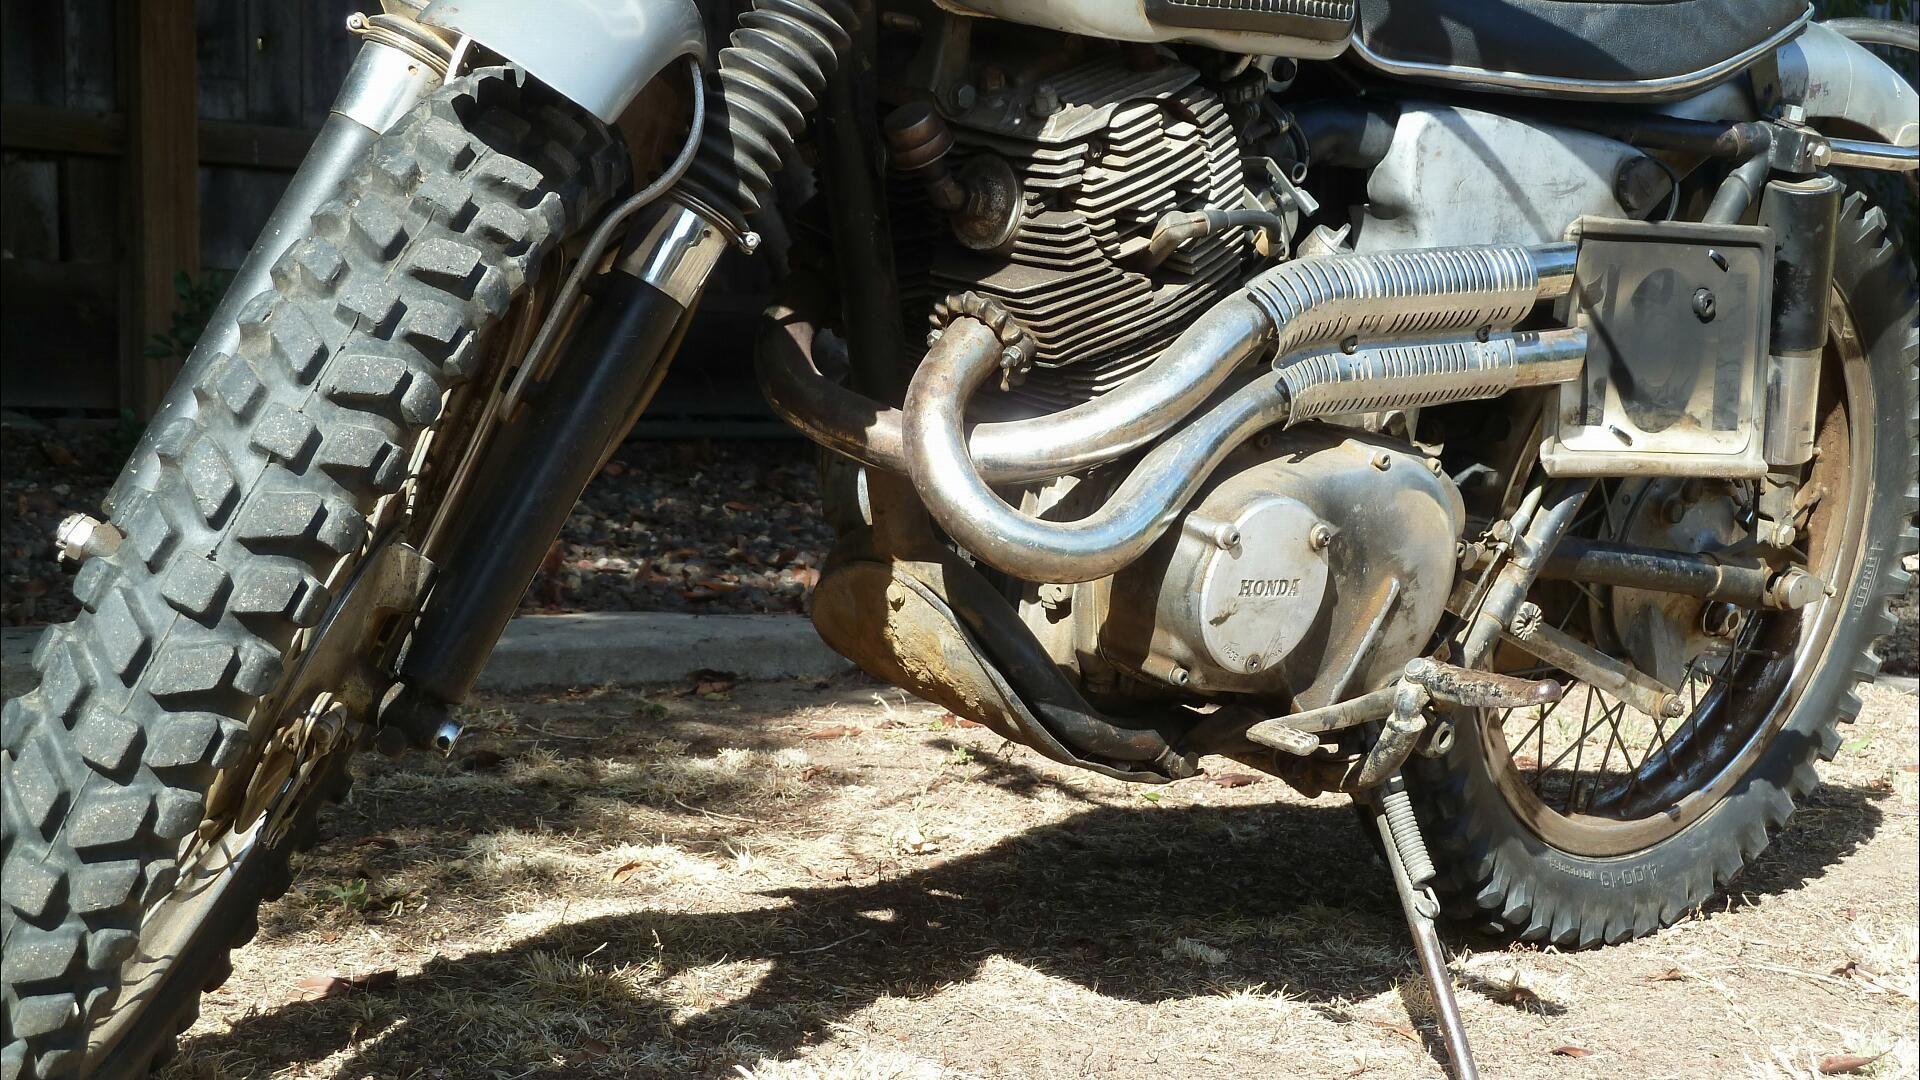 1965 Honda 305 Cl77 Race Scrambler Honda Scrambler Vintage Motocross [ 1080 x 1920 Pixel ]